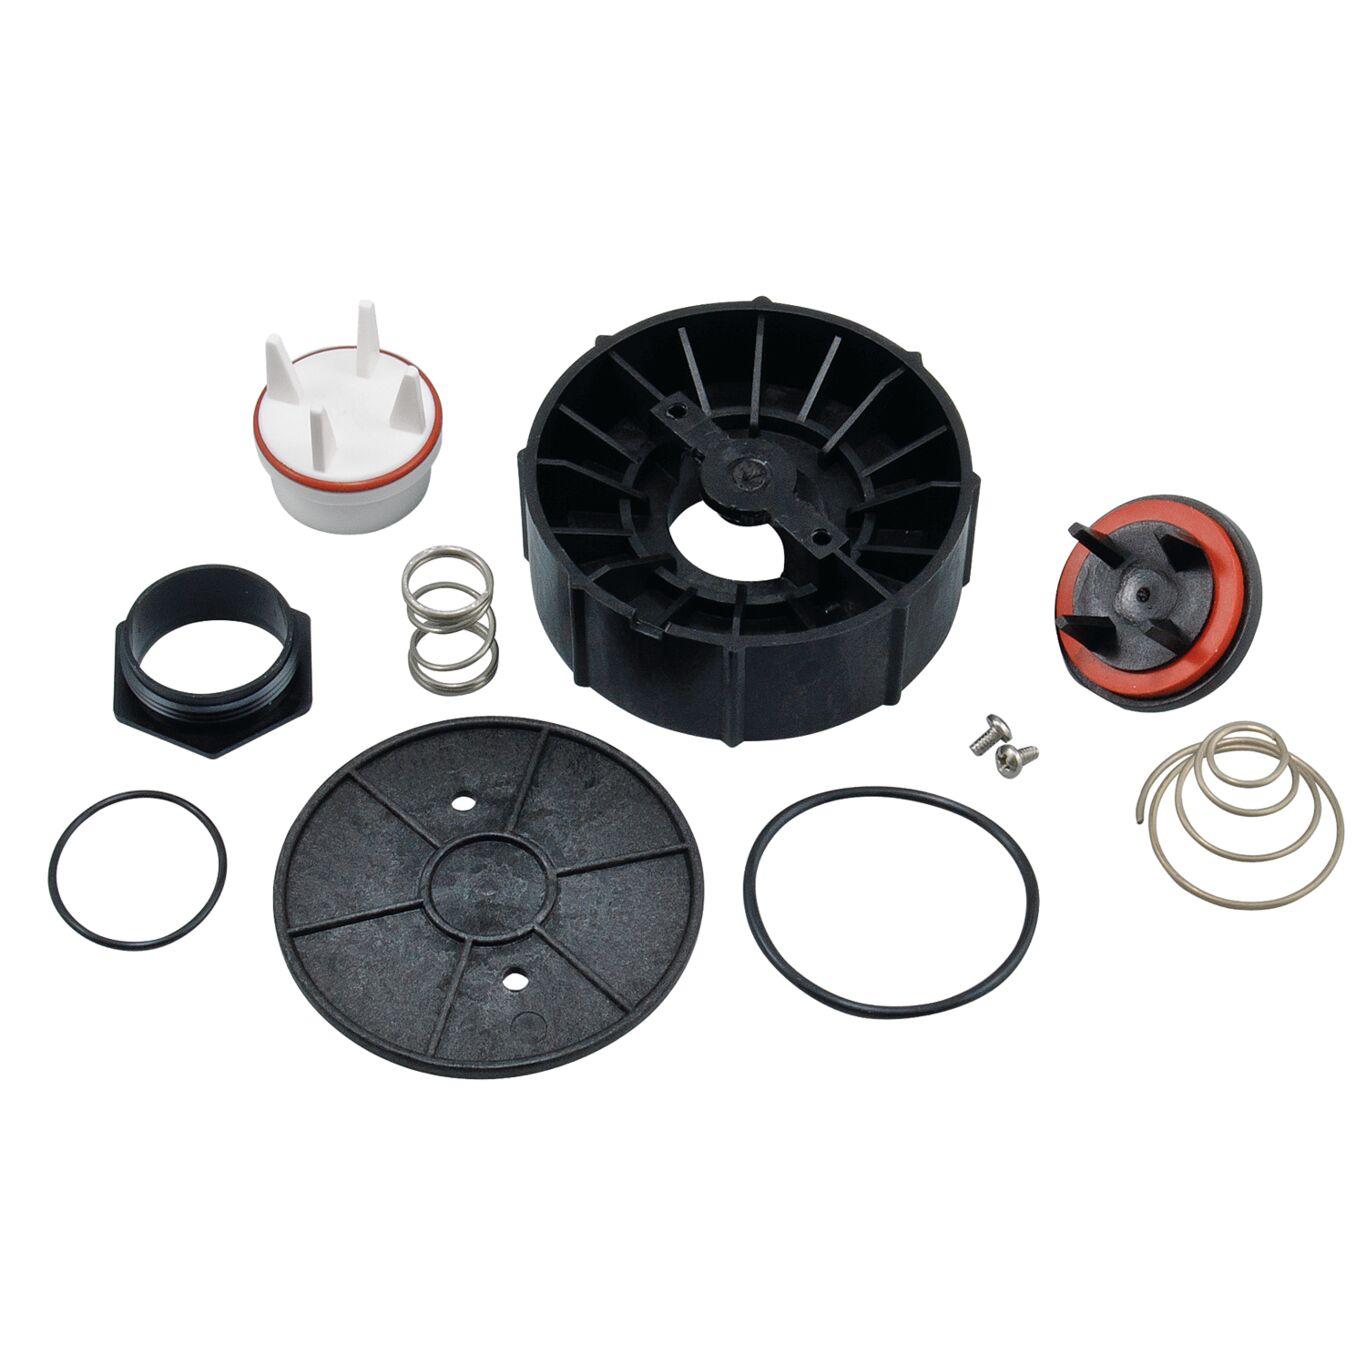 Pamoto GP 800 2007 2014 Kit de maintenance